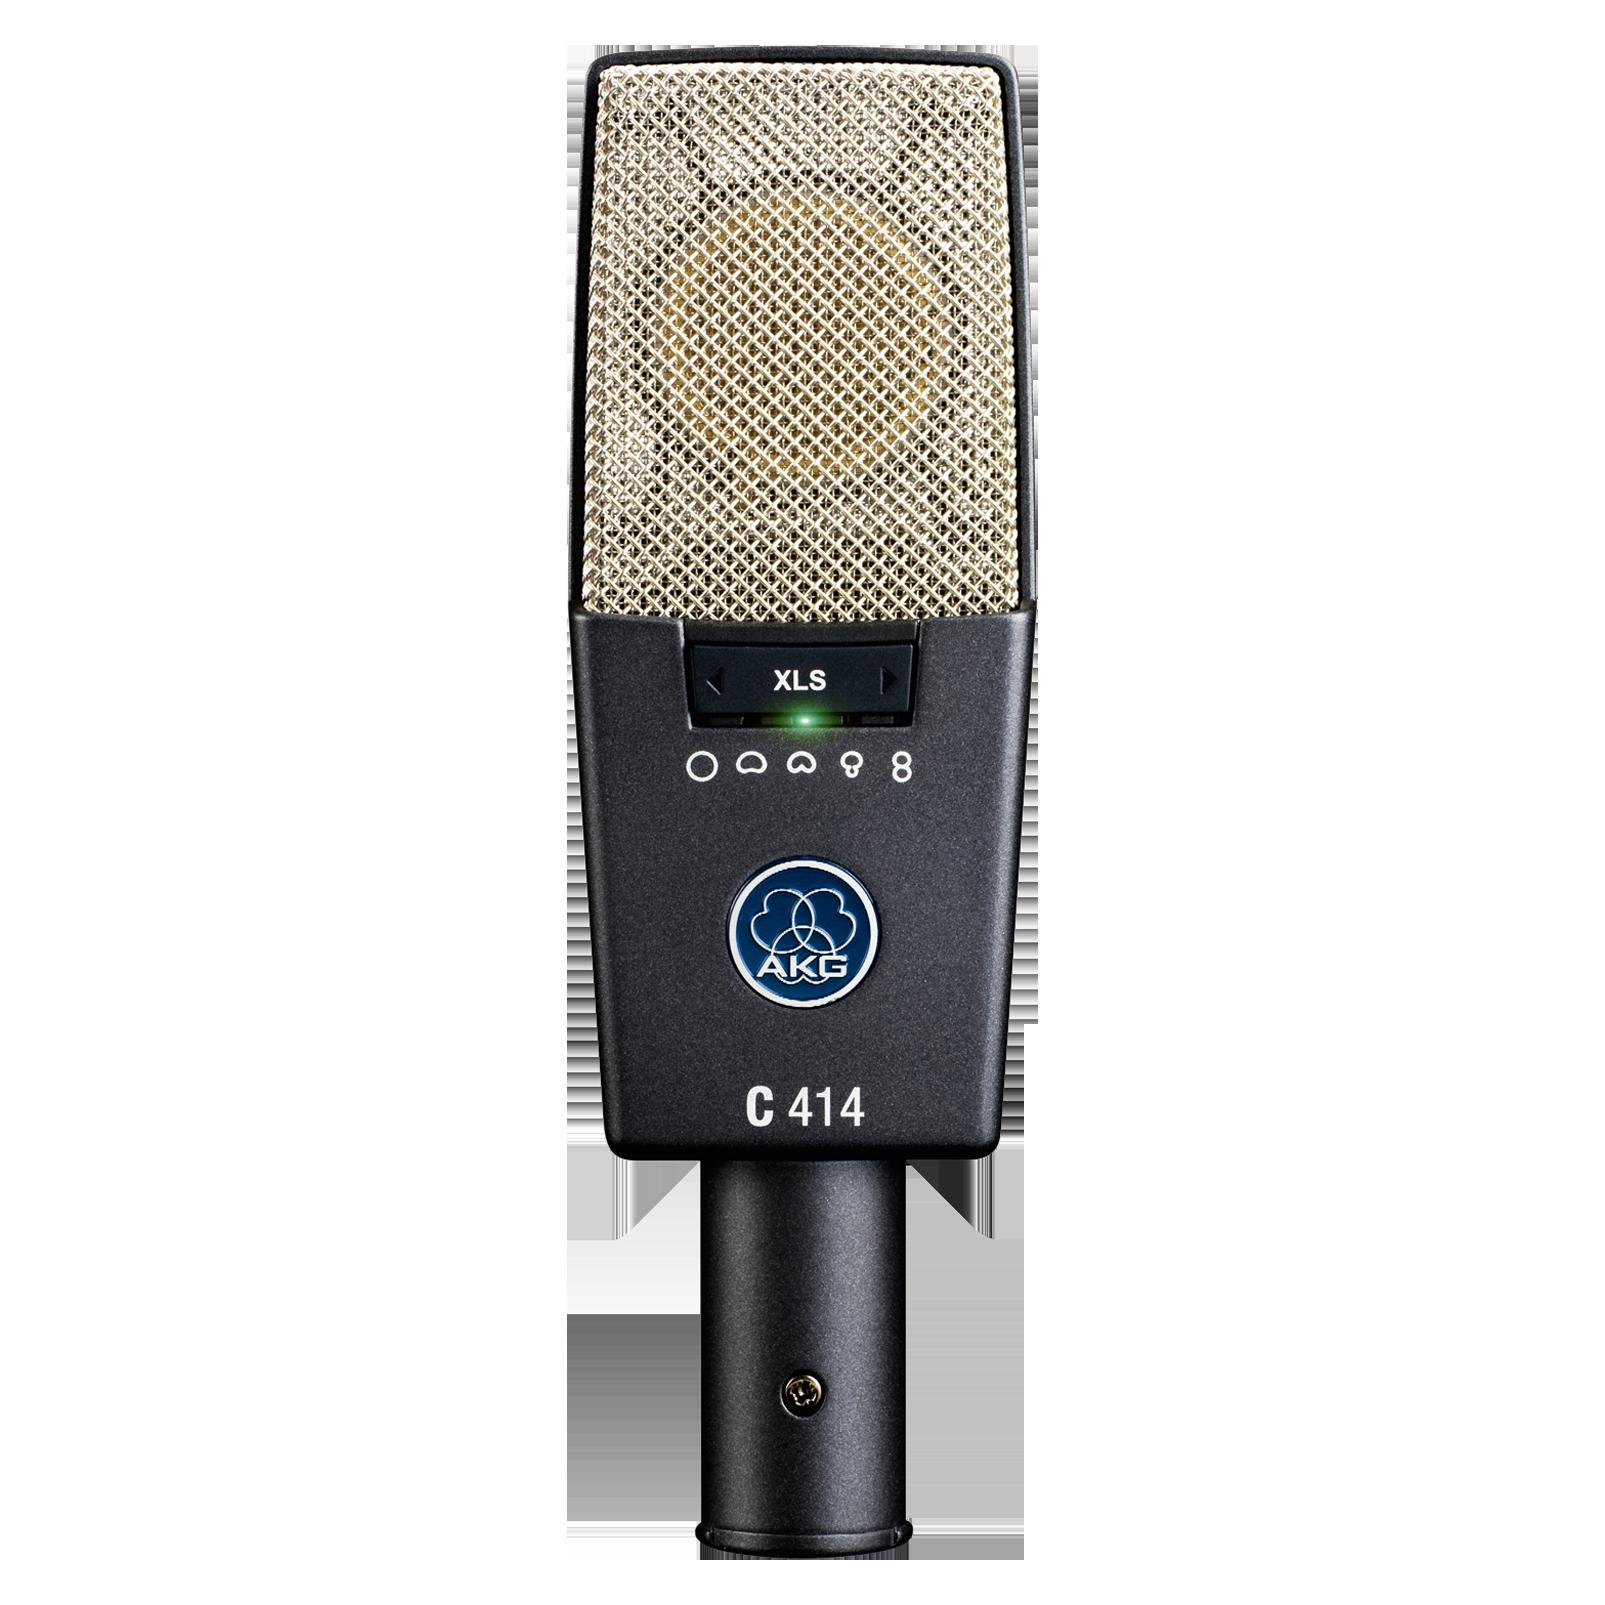 C414 XLS - Black - Reference multipattern  condenser microphone - Hero